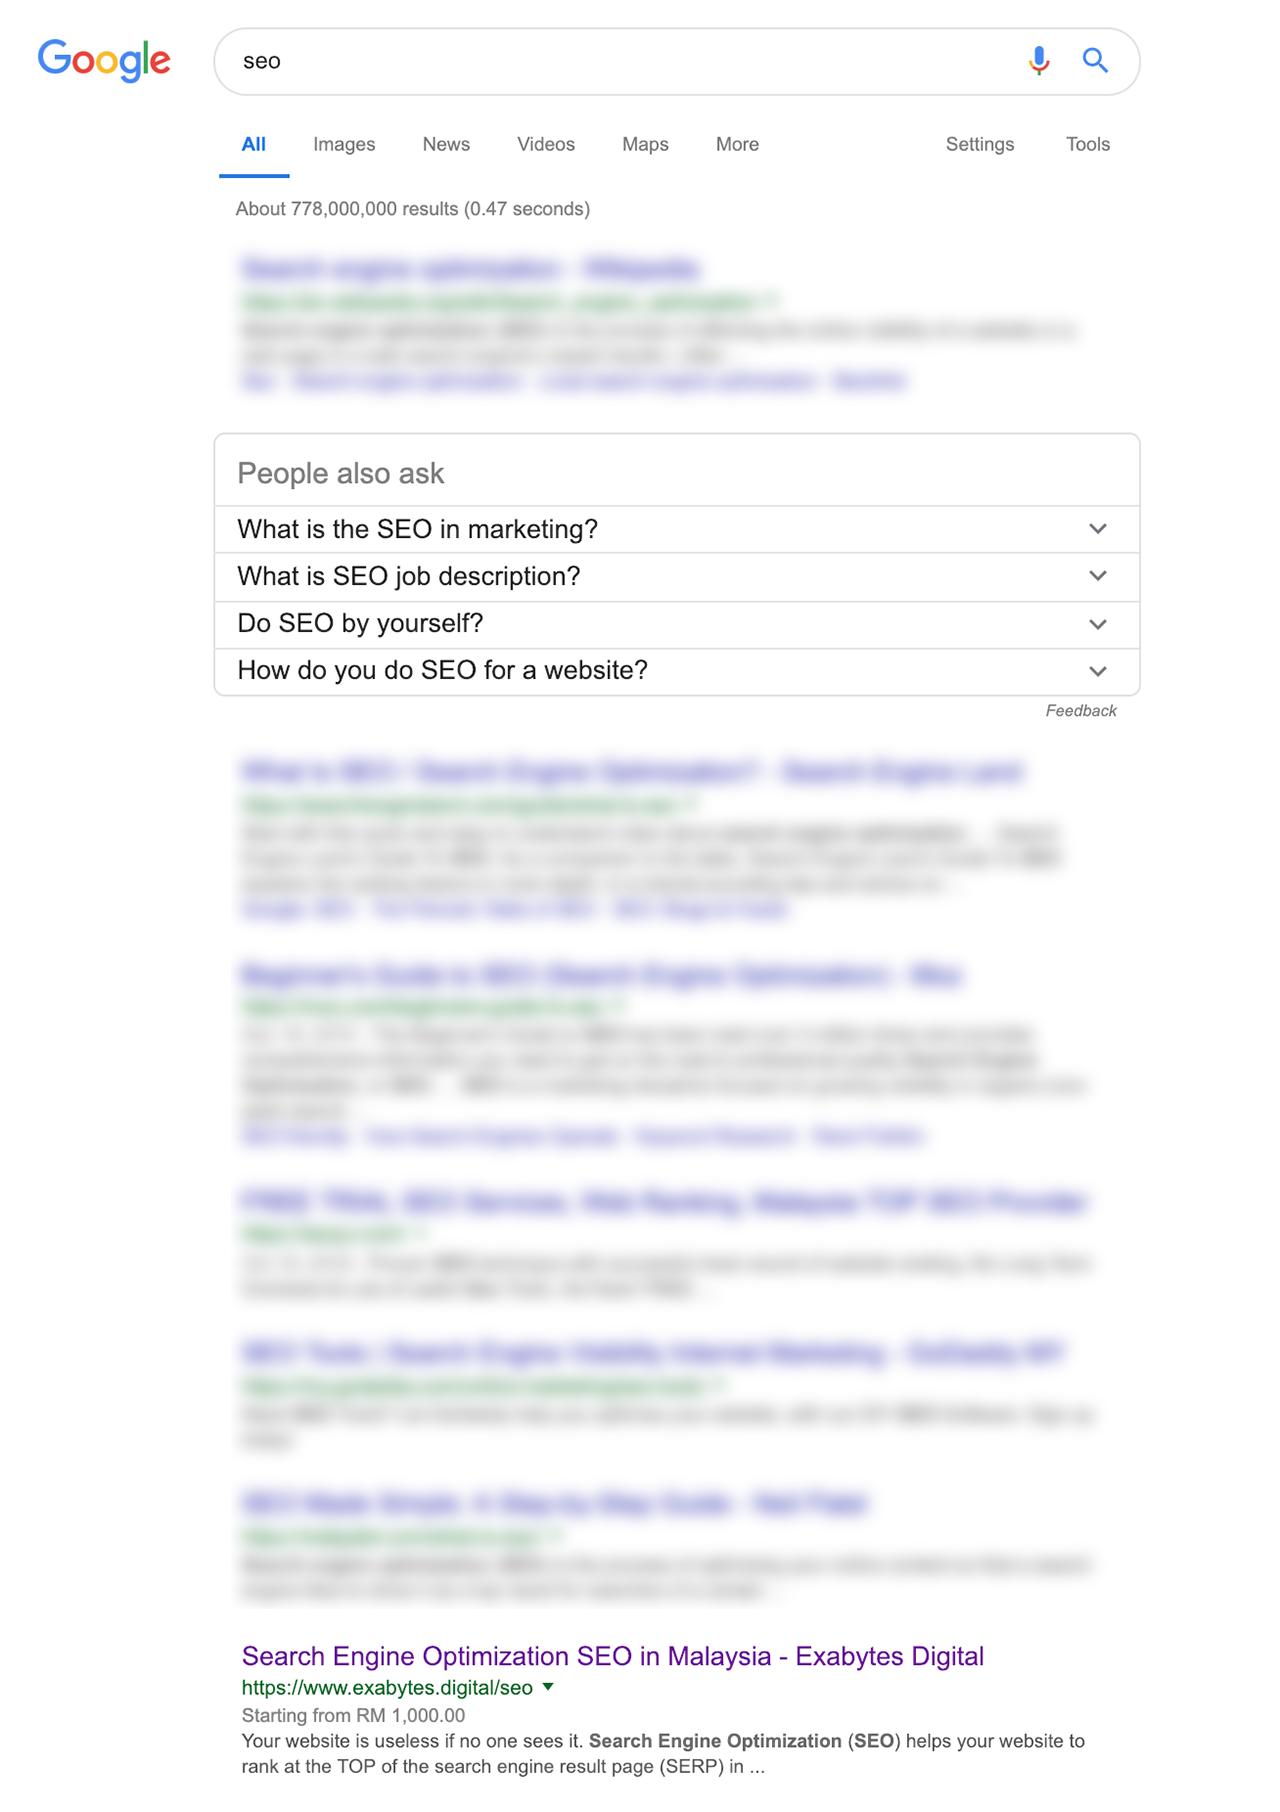 Search Engine Optimazation (SEO)